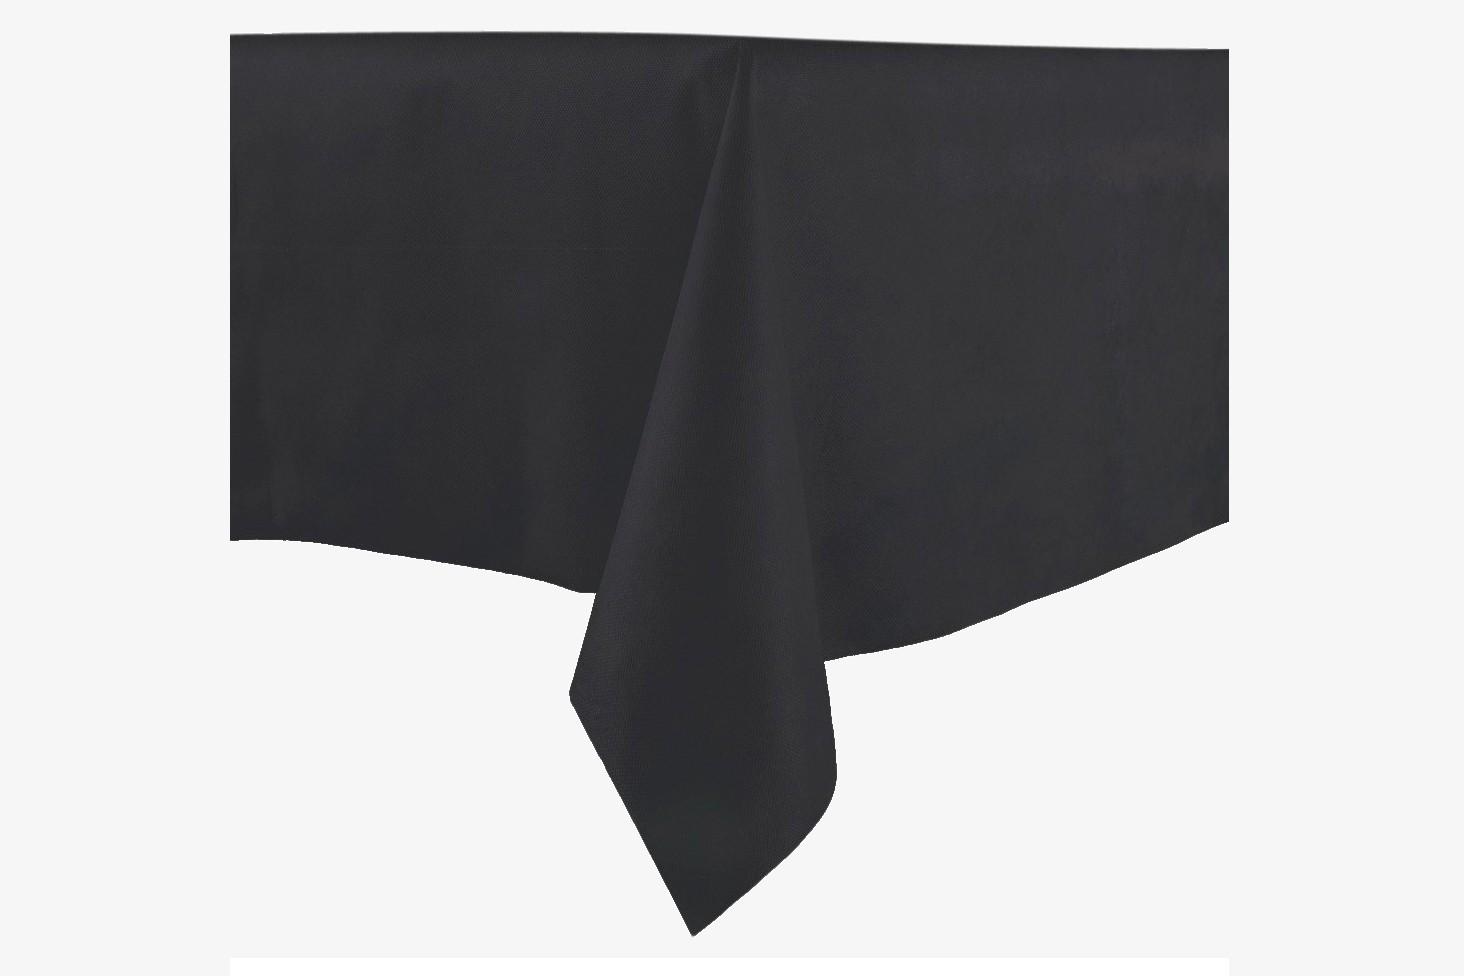 ZB105x105HN 黑色桌布 105x105cm 20条